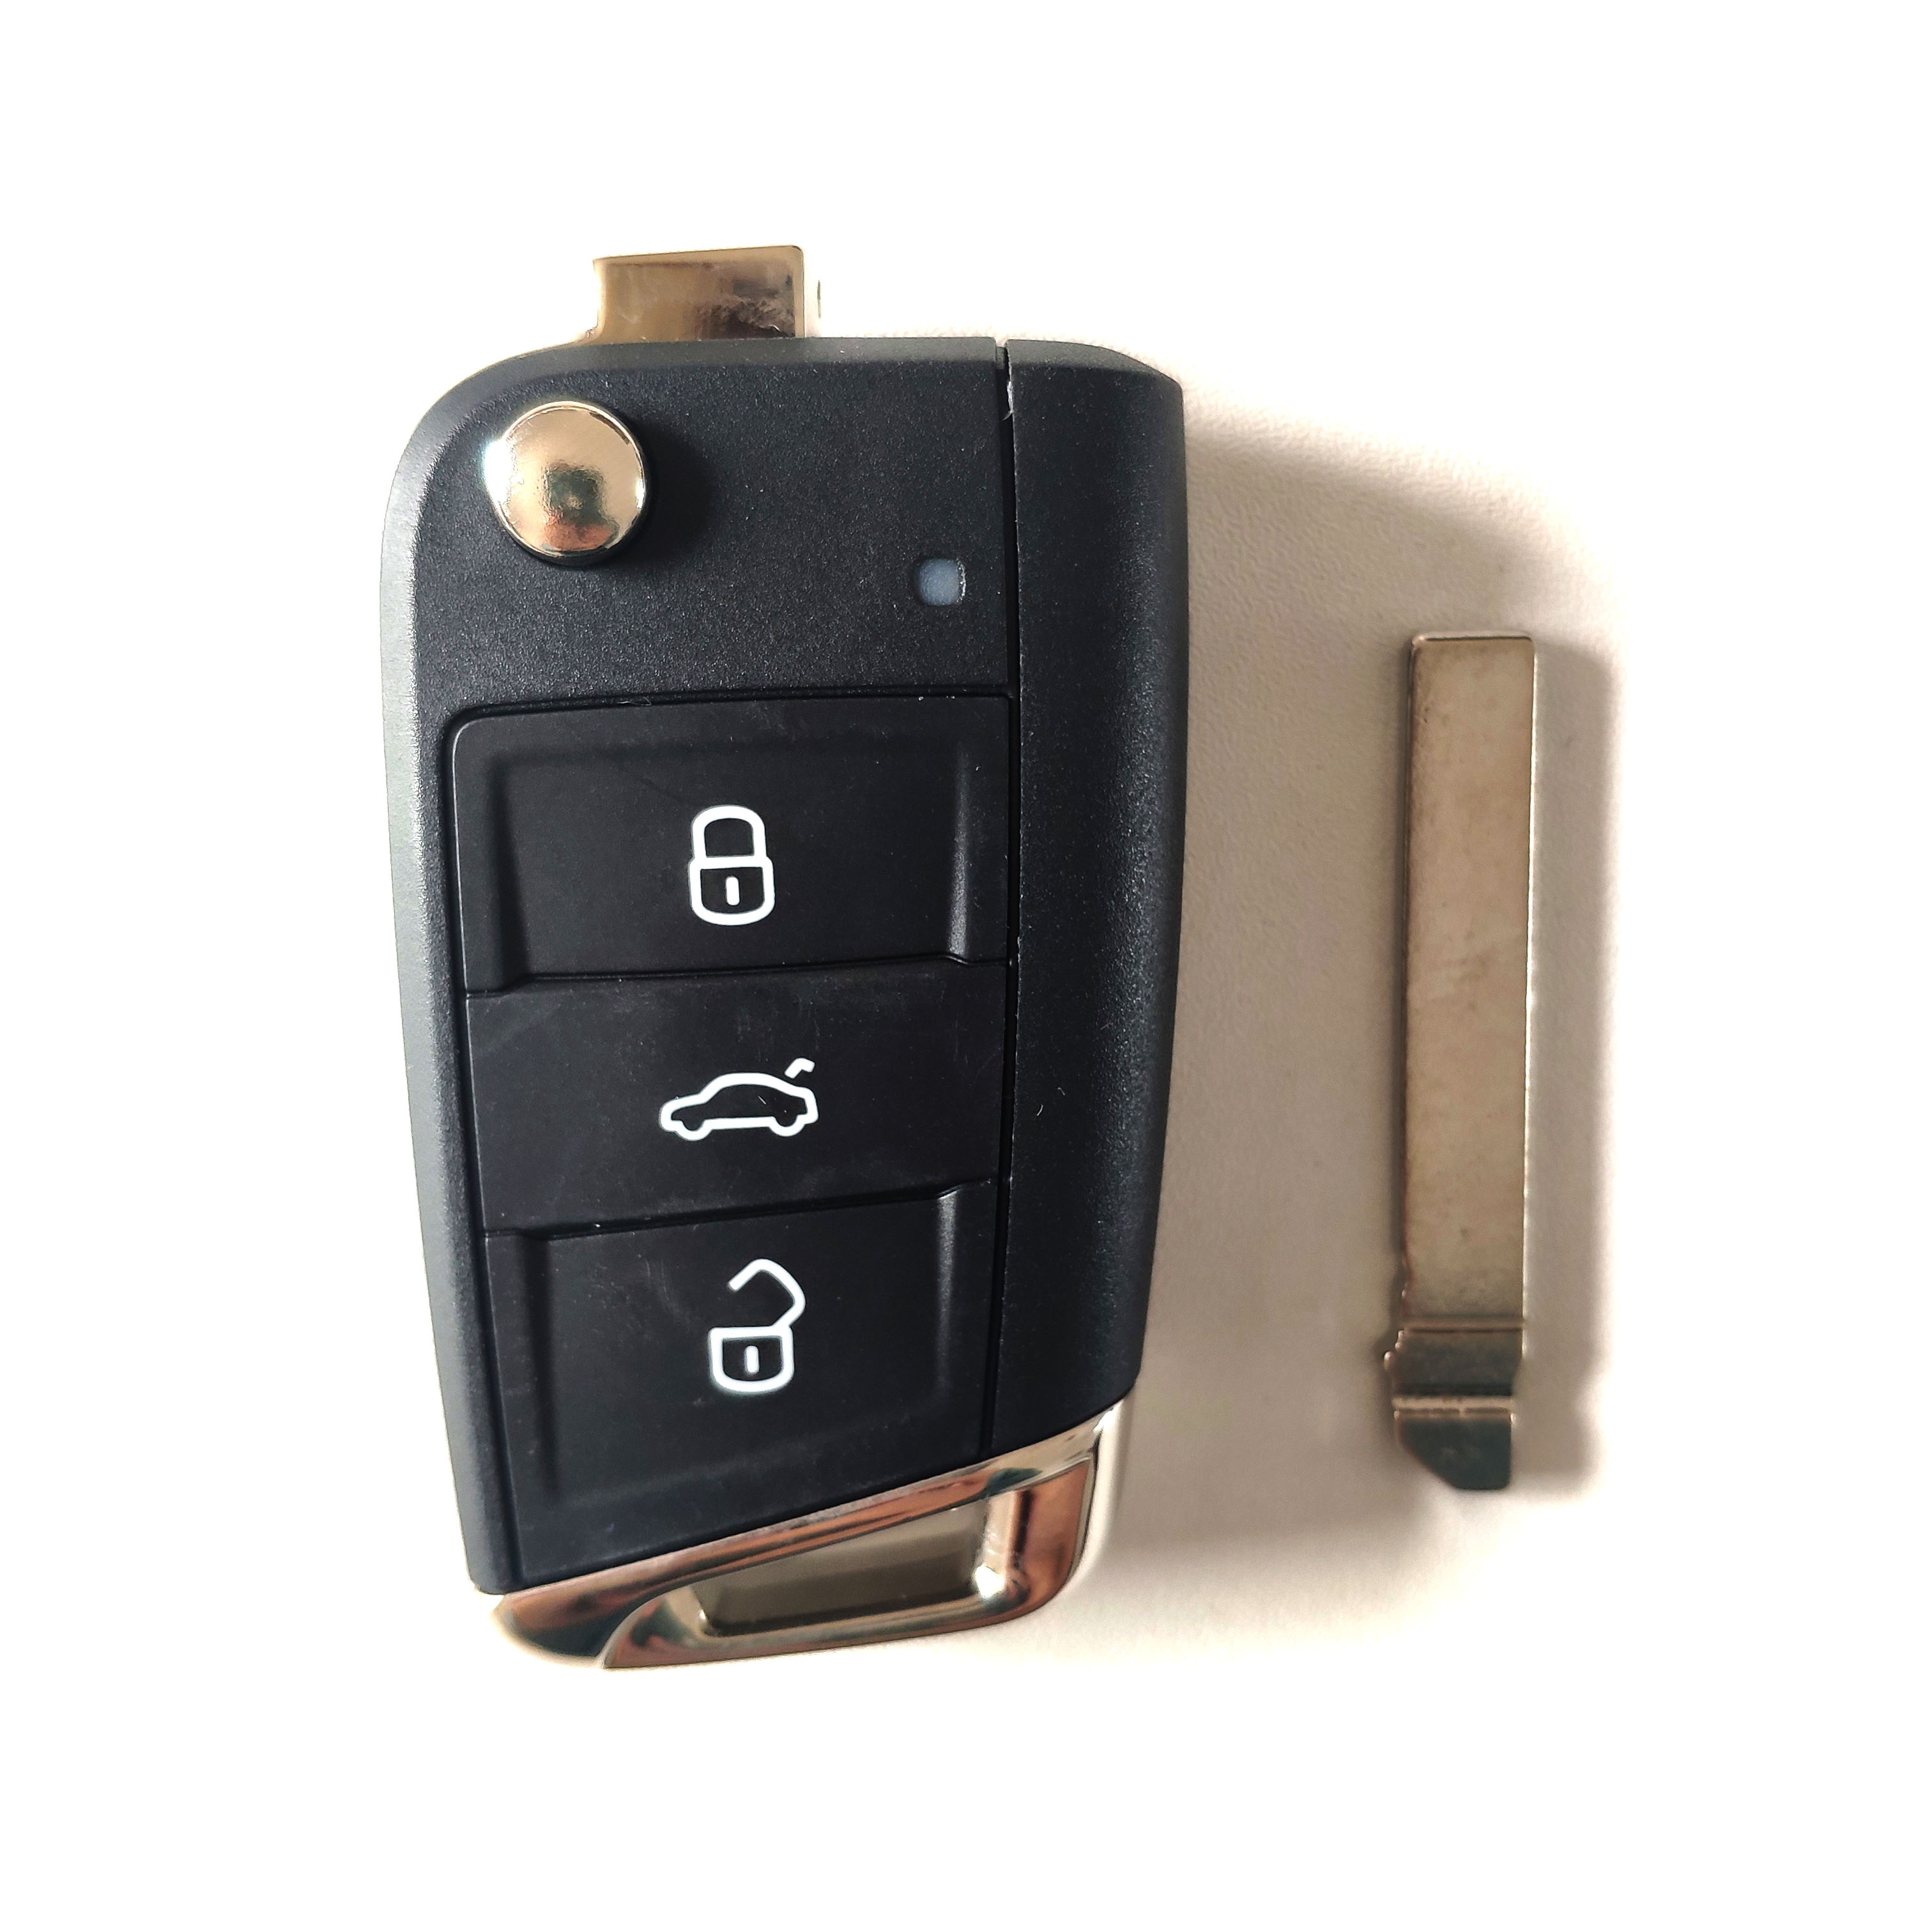 Original 3 Buttons 434MHZ Flip Proximity Key for New type VW Jetta 5CG 959 752 E